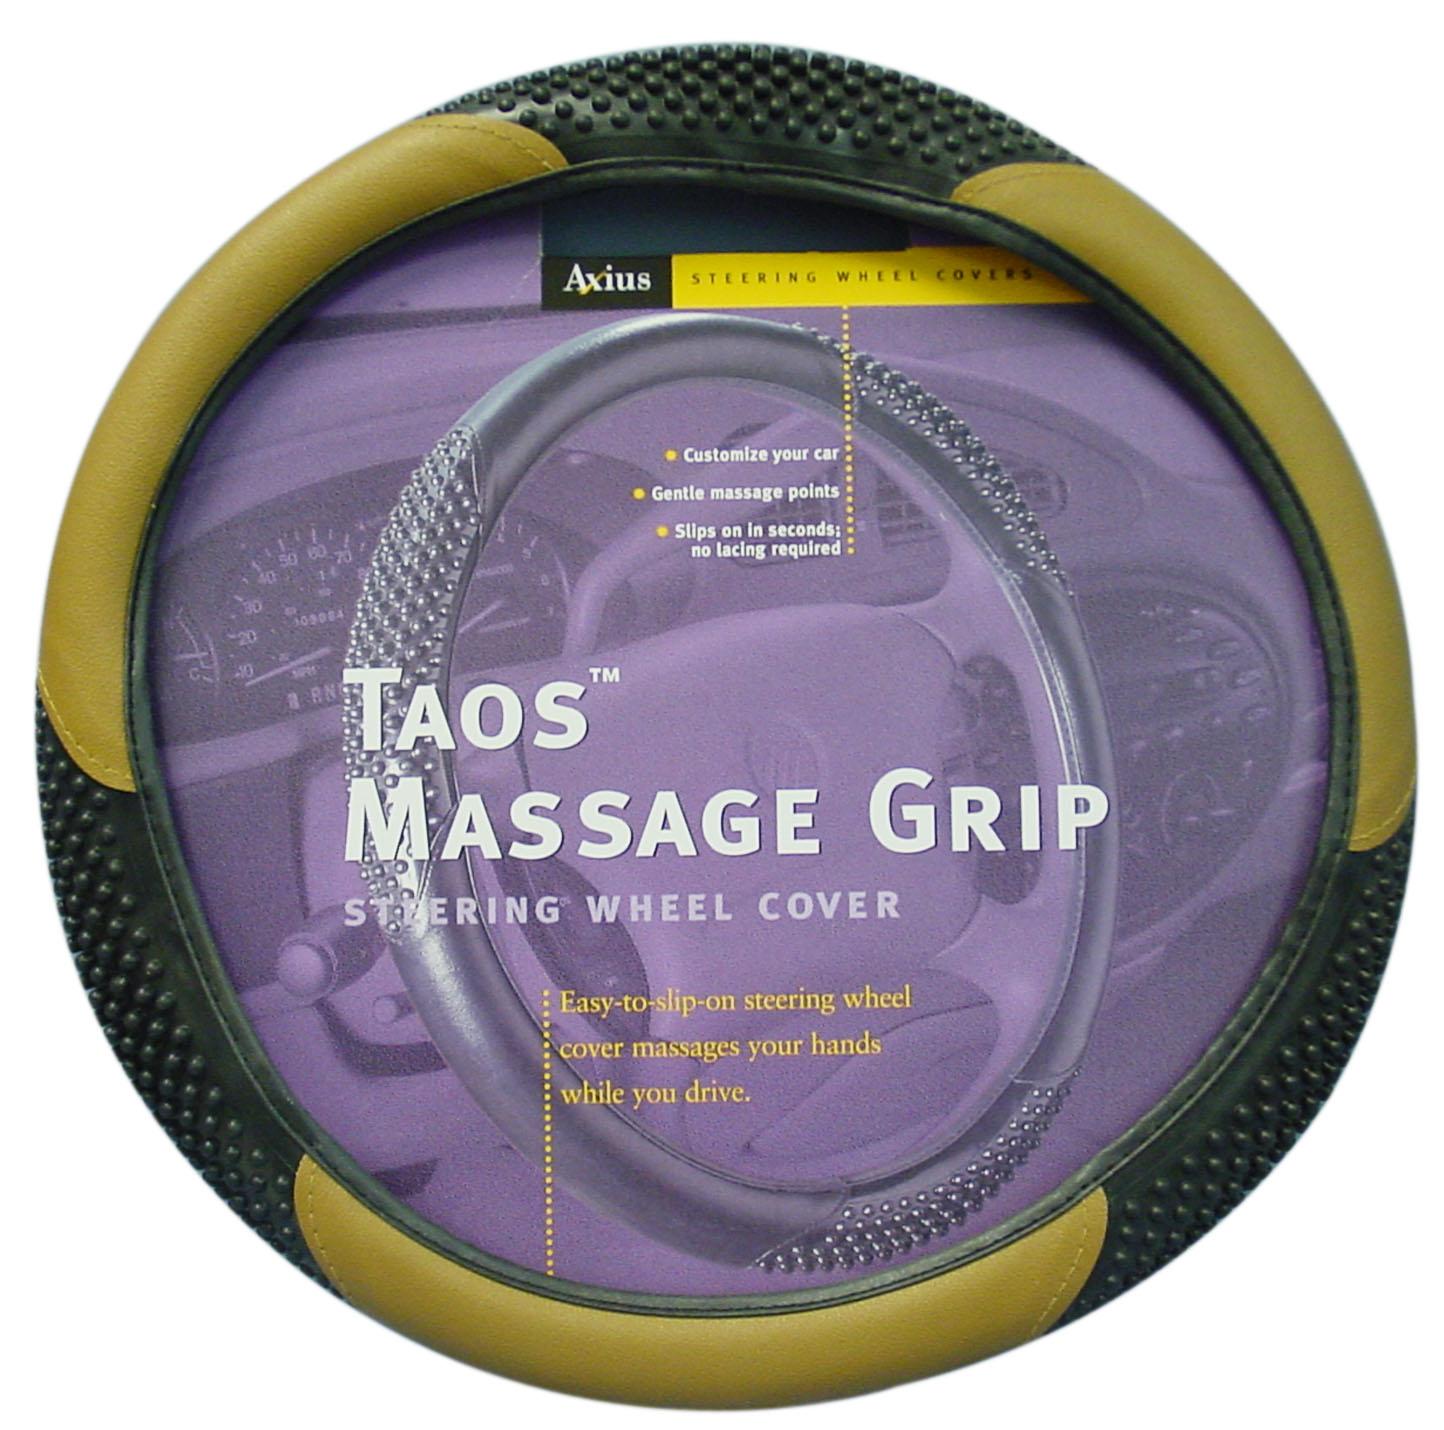 04637909 - Taos Massage Grip Steering Wheel Cover - Tan